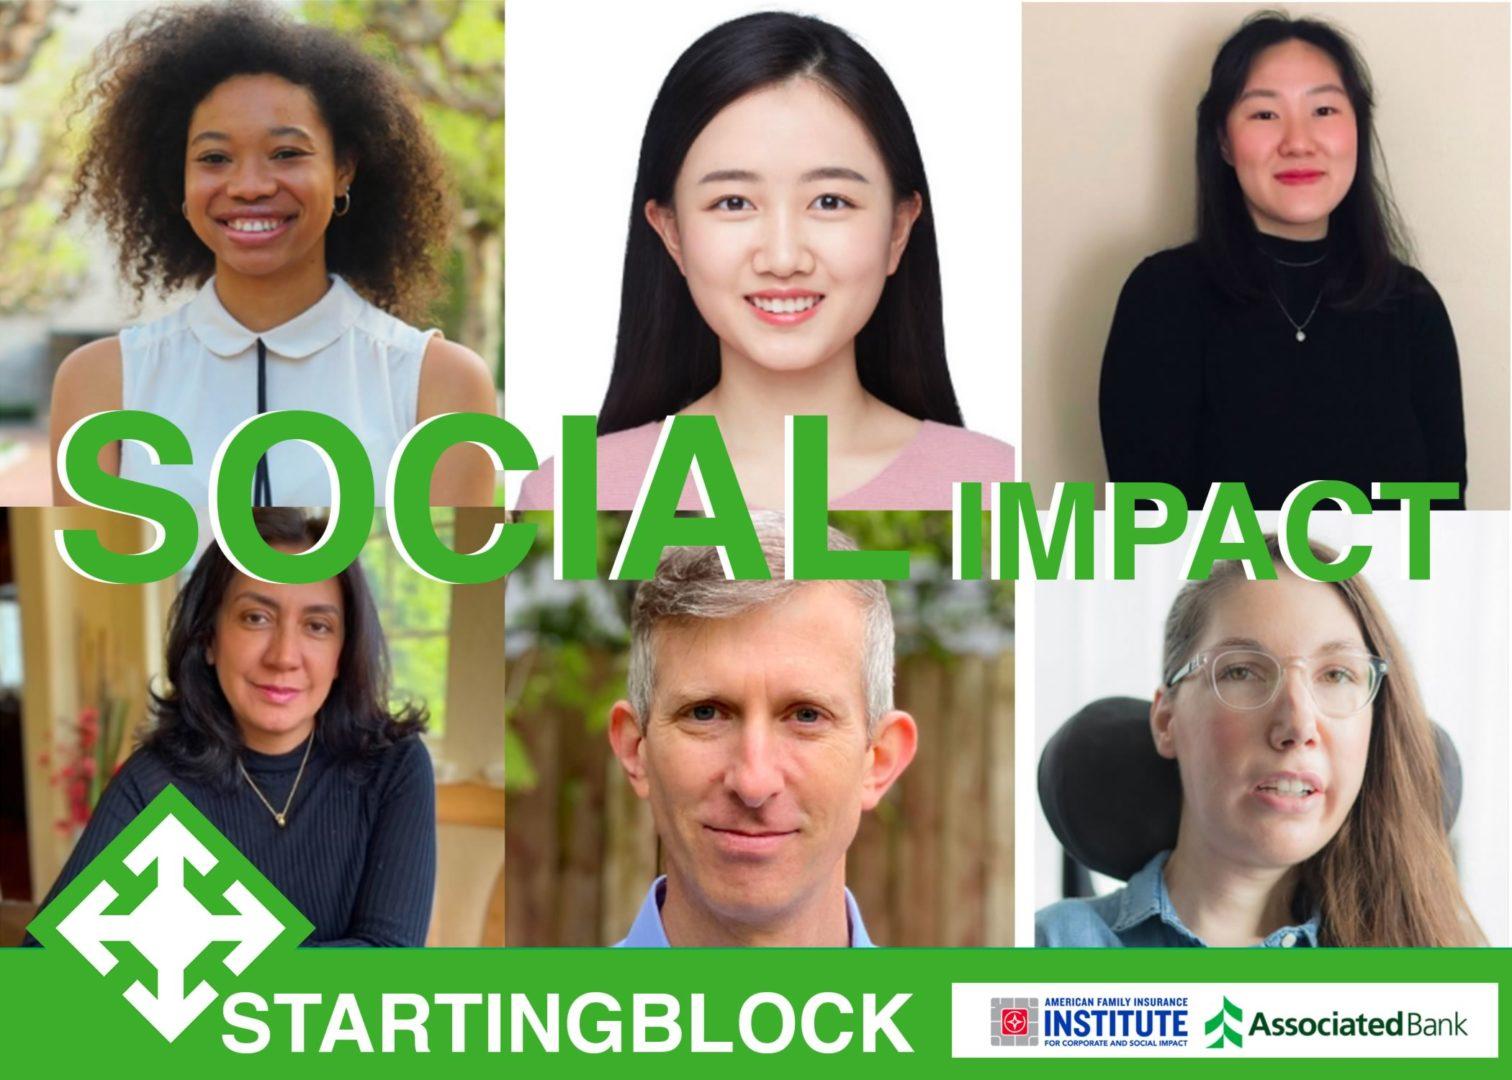 Social-Impact graphic